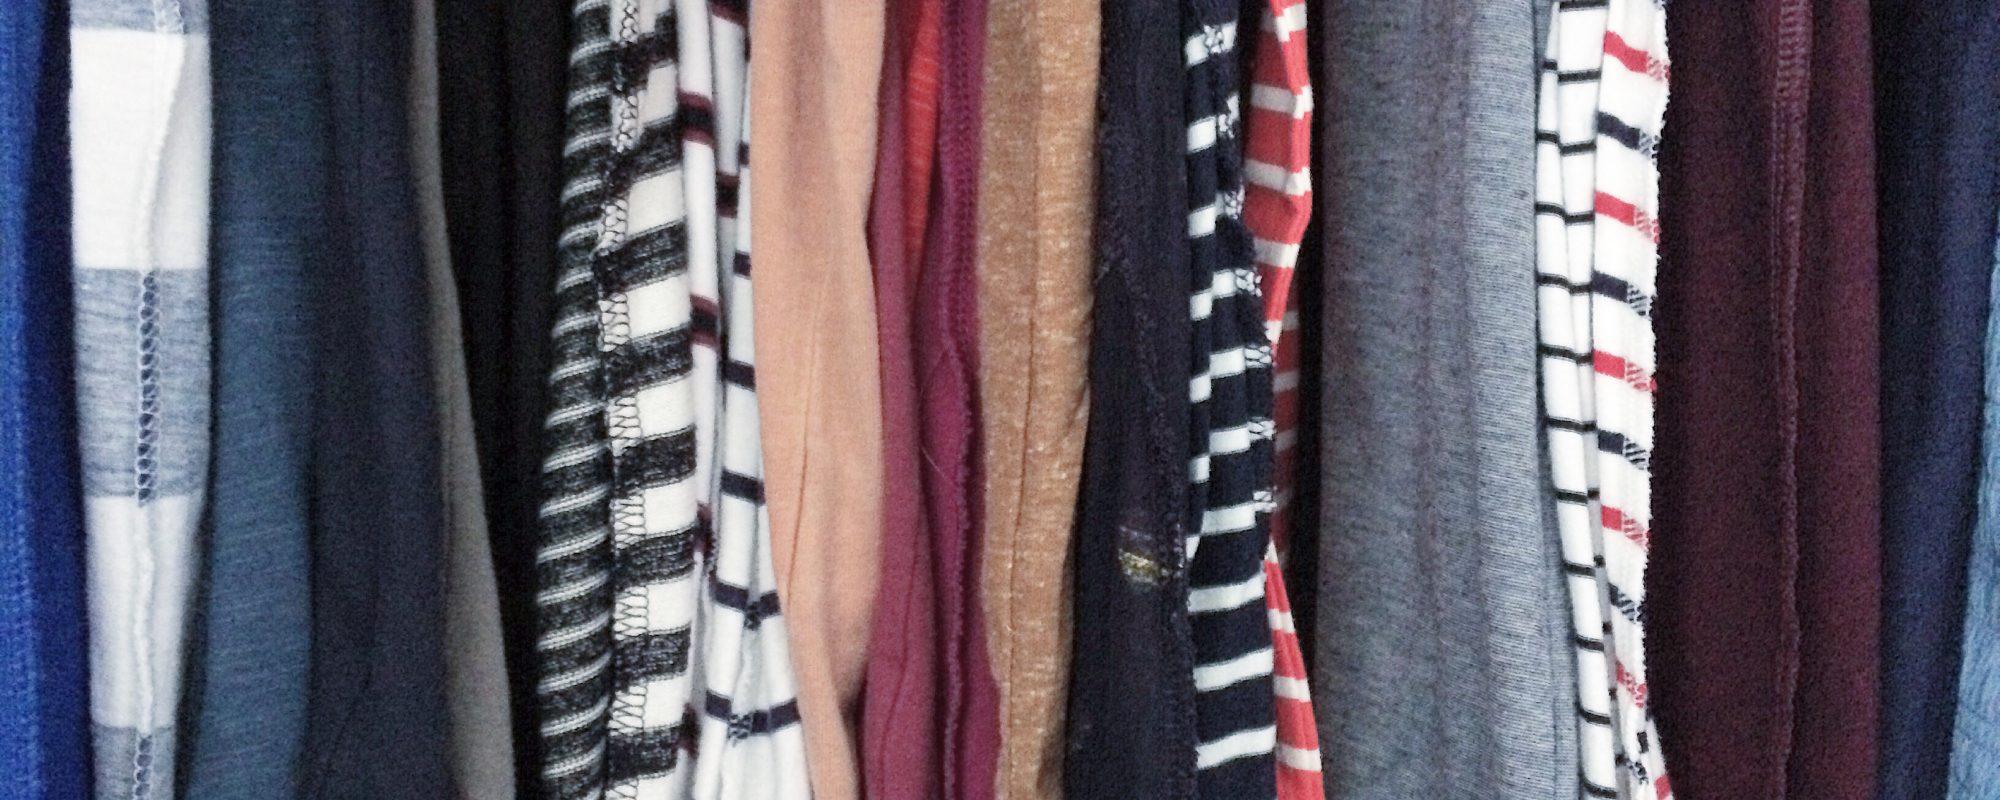 why-ive-streamlined-my-wardrobe-header